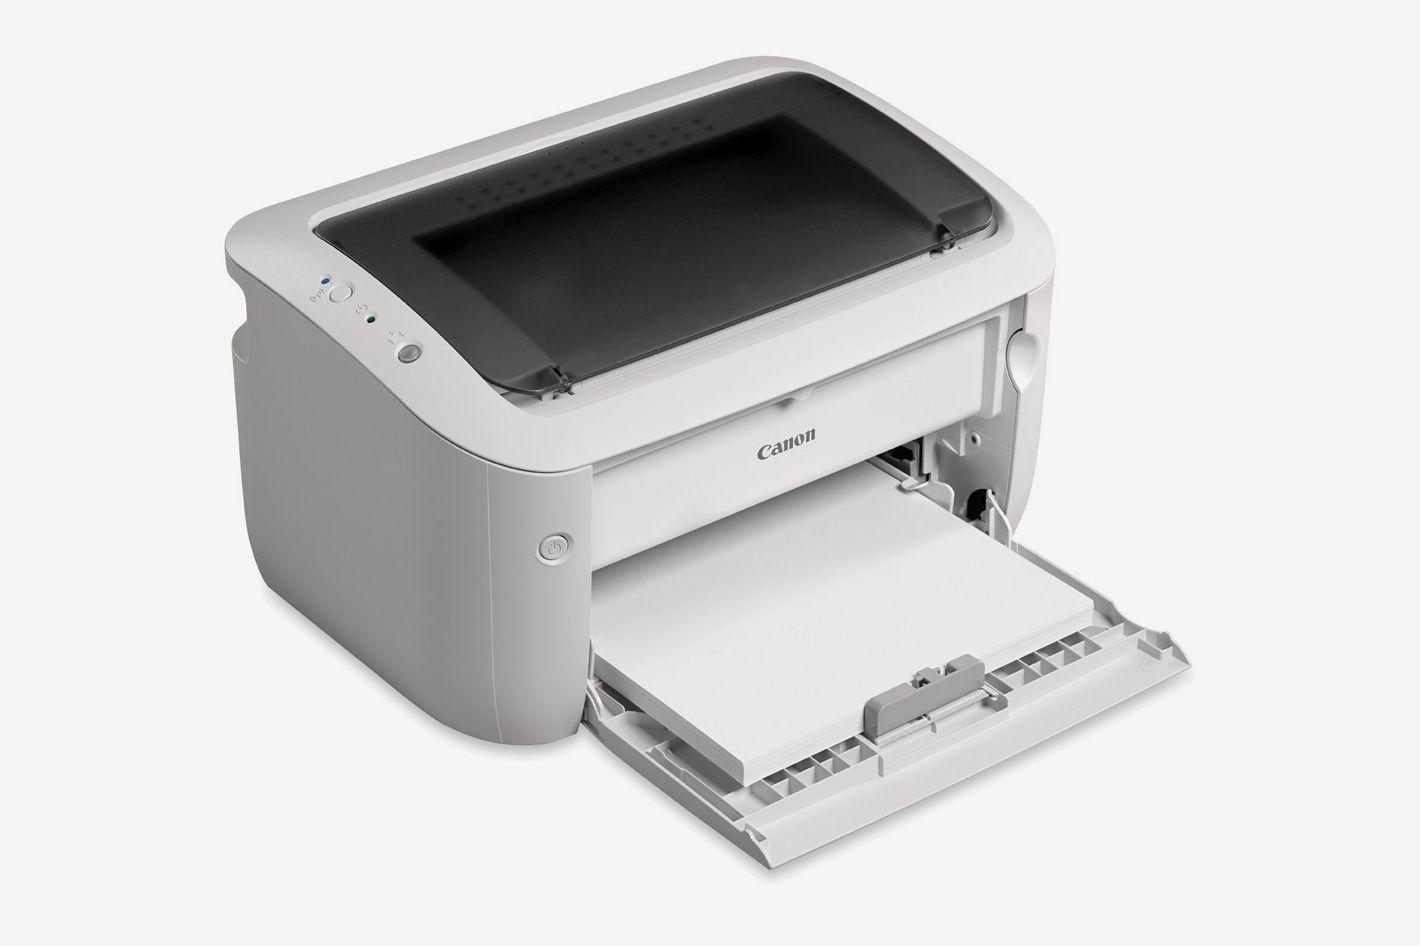 Canon imageCLASS LBP6030w Wireless Laser Printer